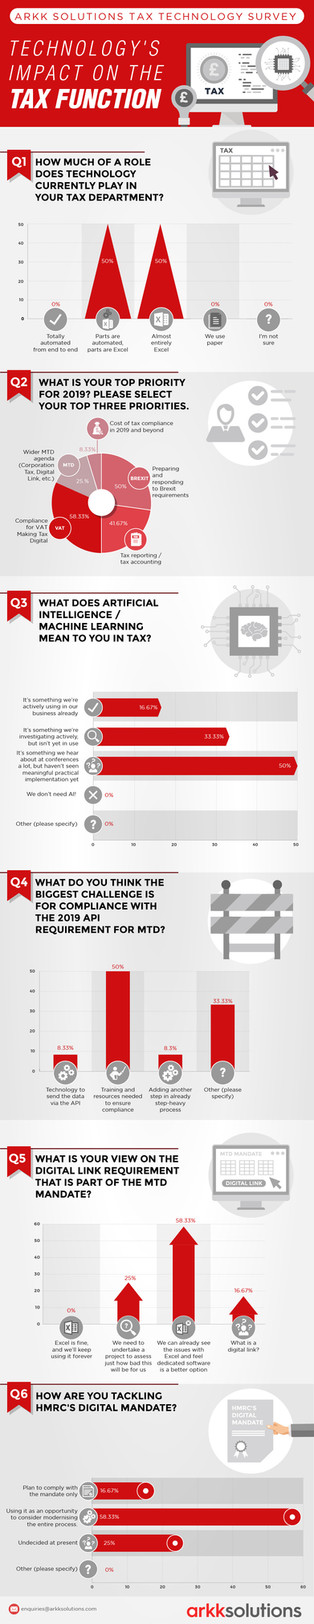 Arkk solution tax technology survey